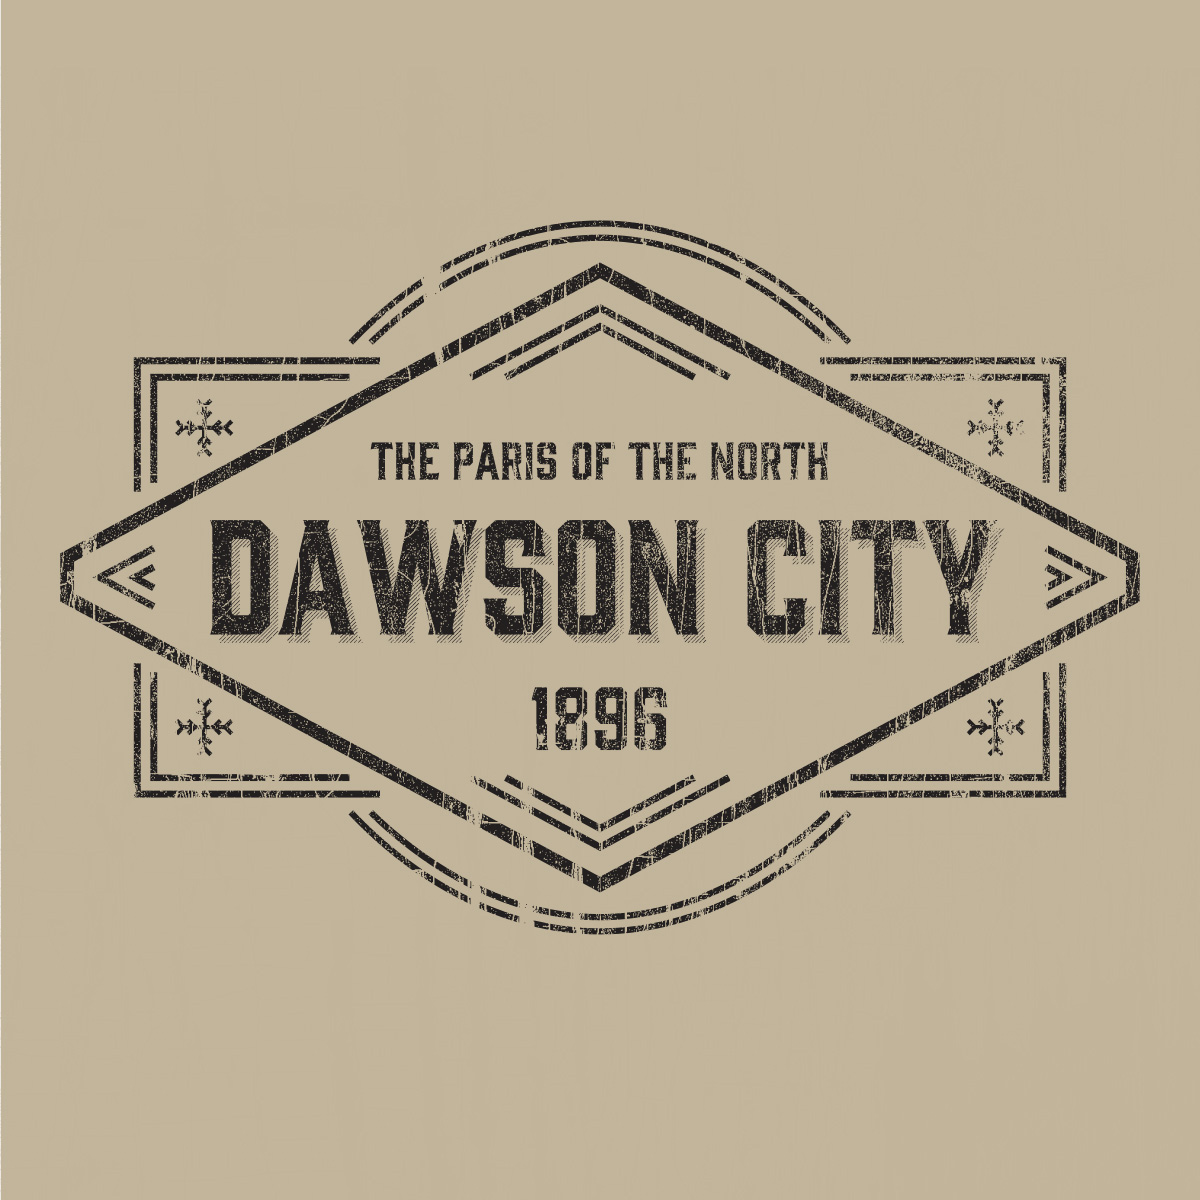 Discovery_Channel_Klondike_dawson_city.jpg